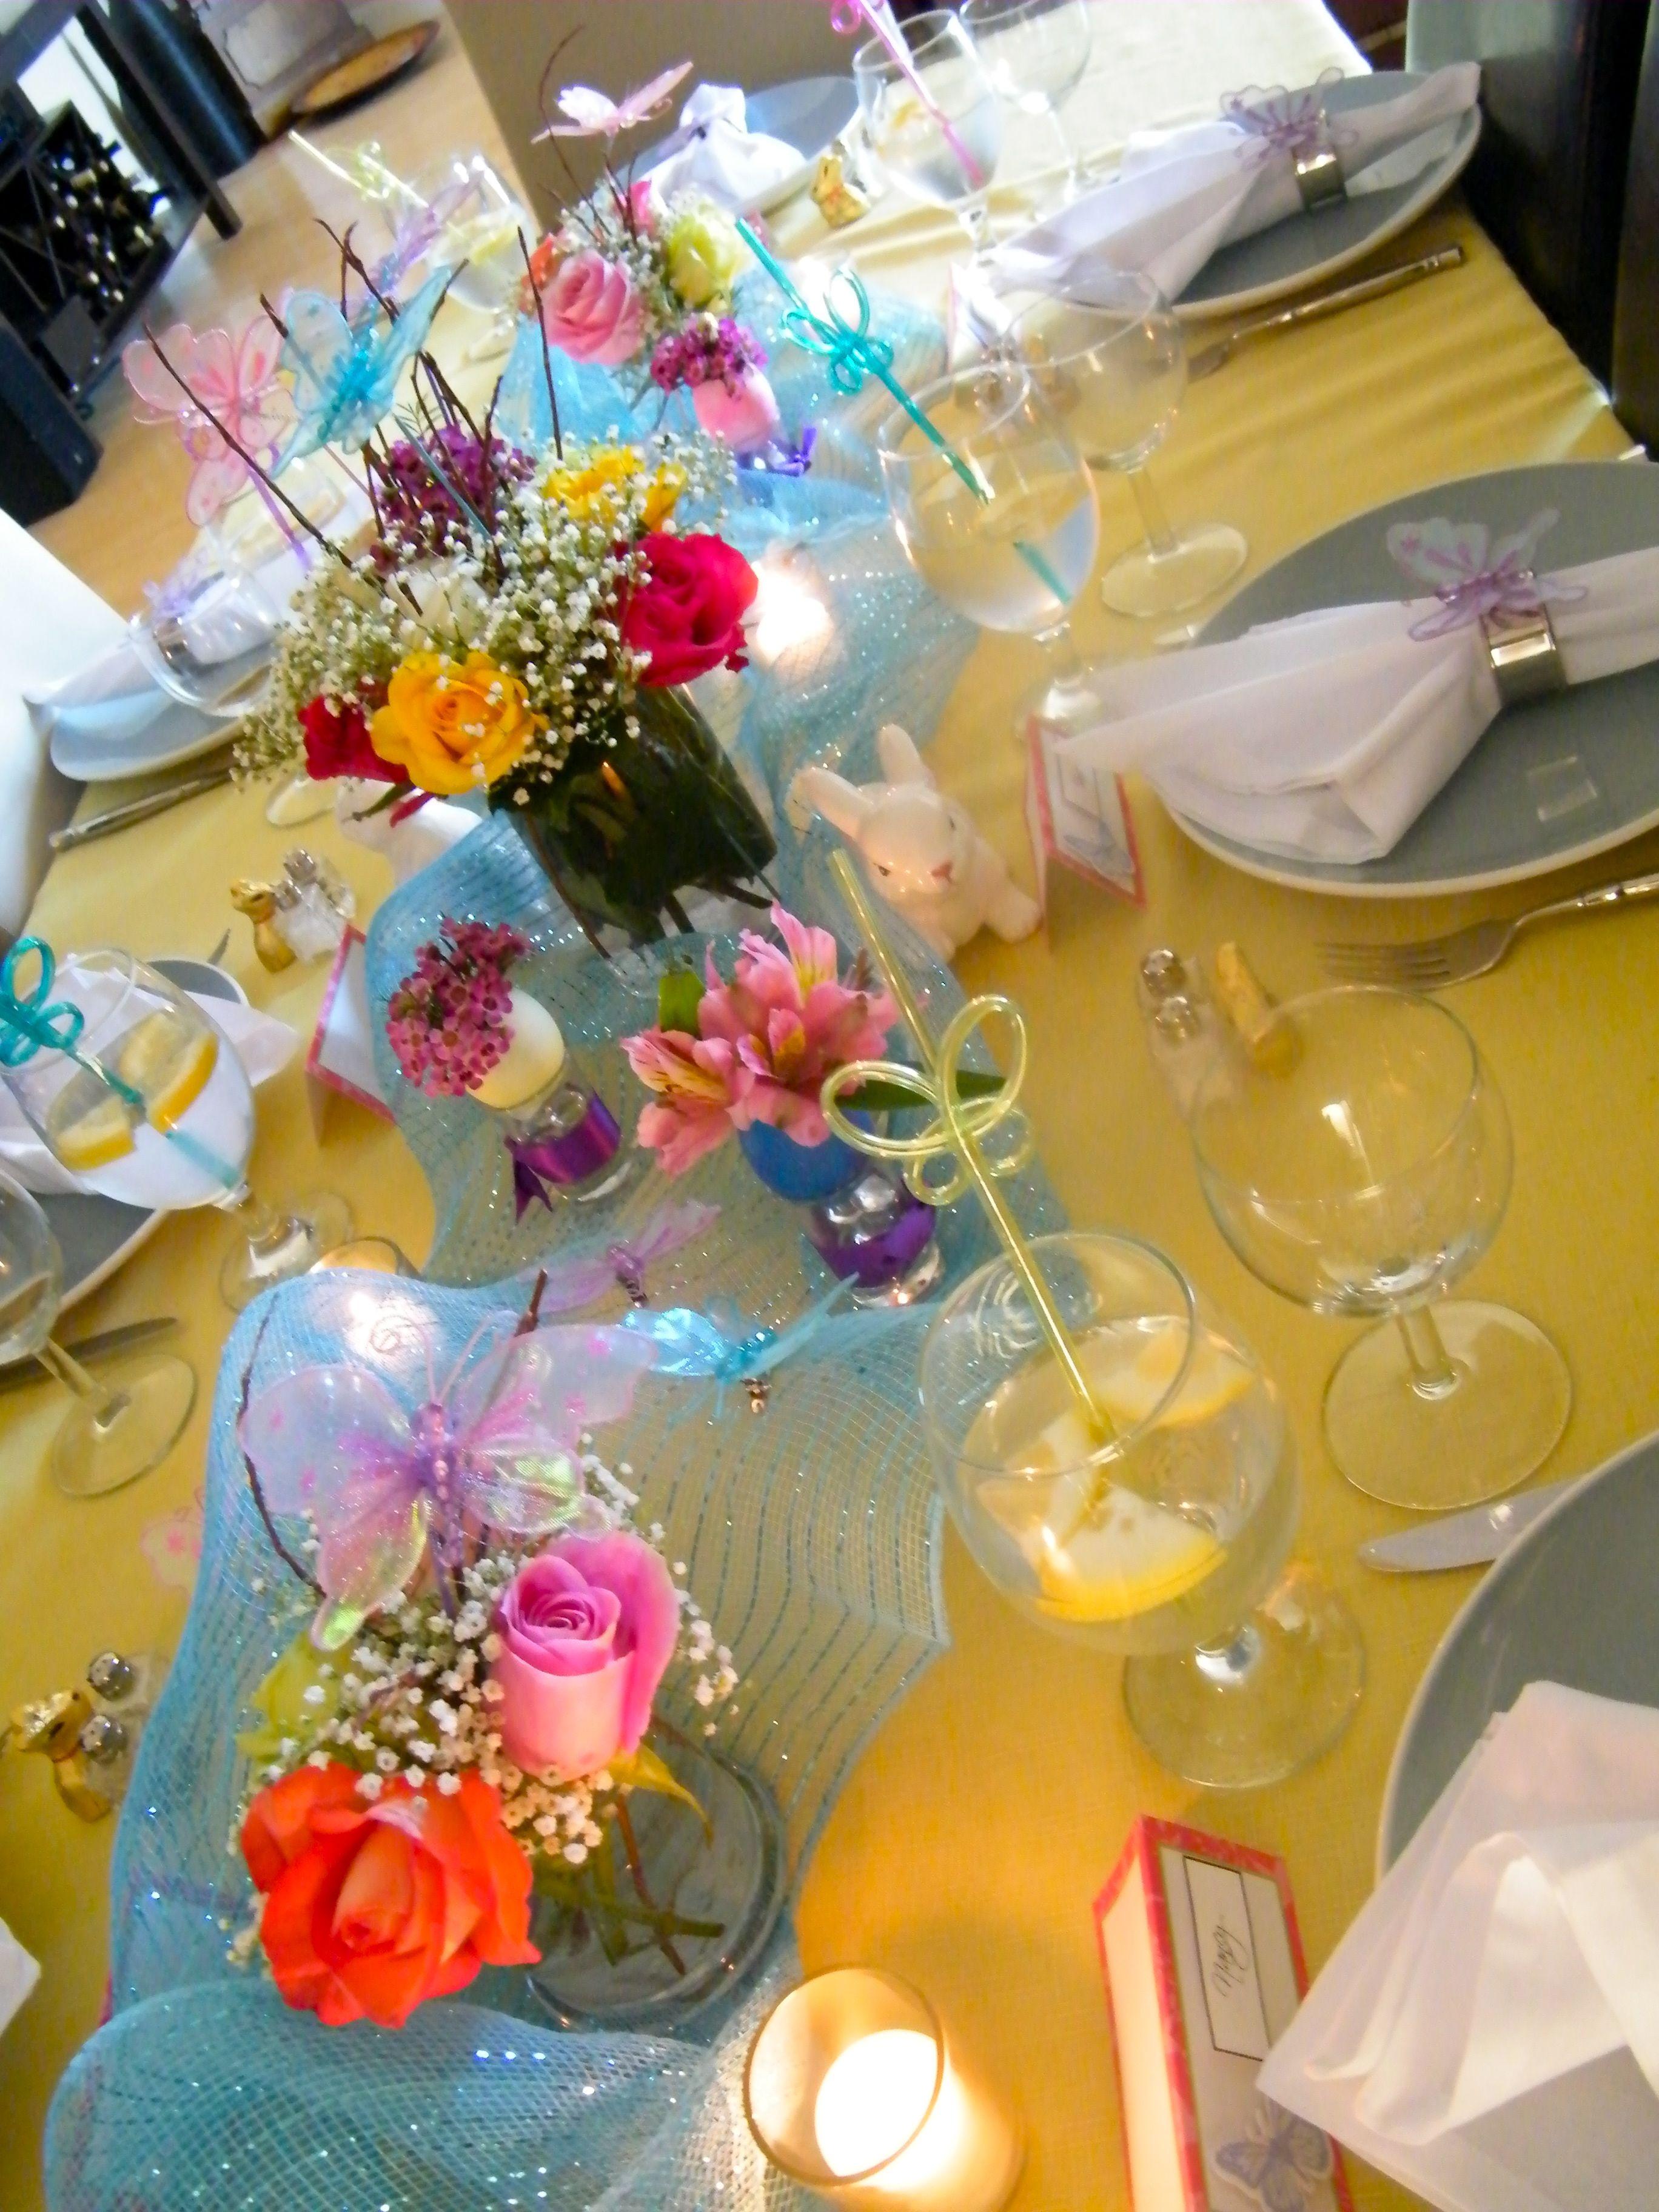 Easter table decor easter ideas pinterest for Easter decorations for the home pinterest